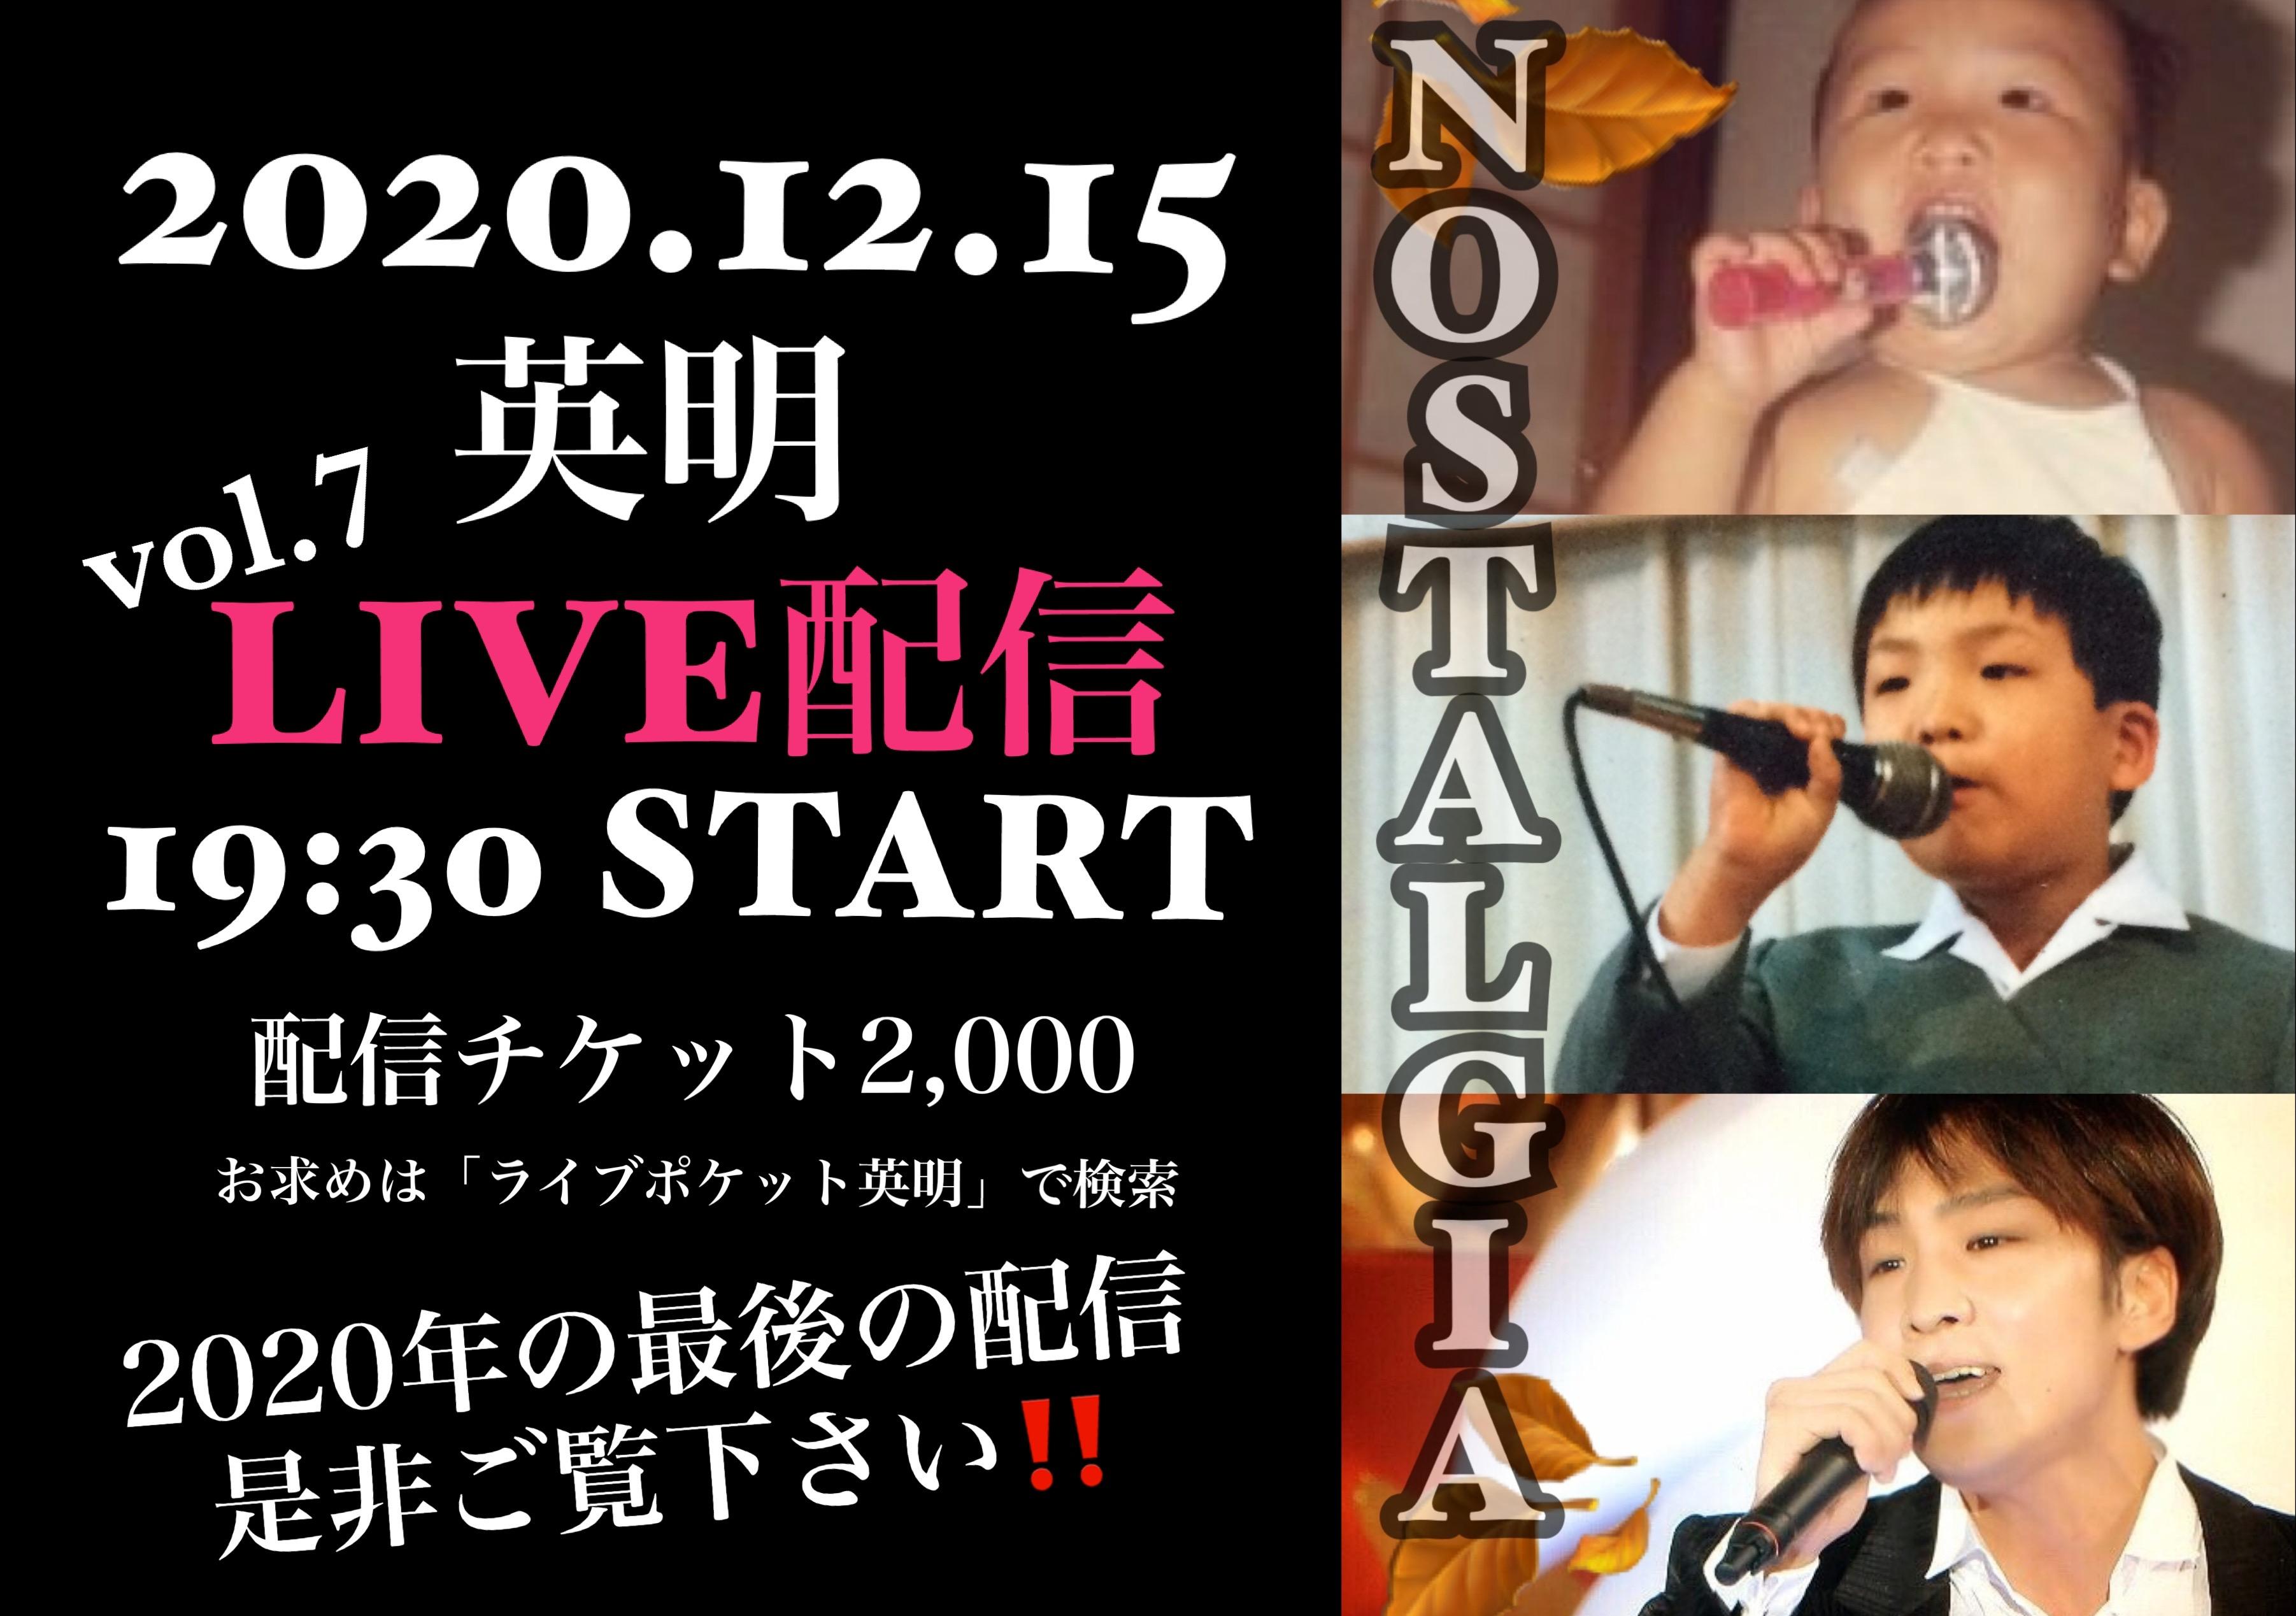 Coverlist 英明 Special LIVE Stream Vol.7